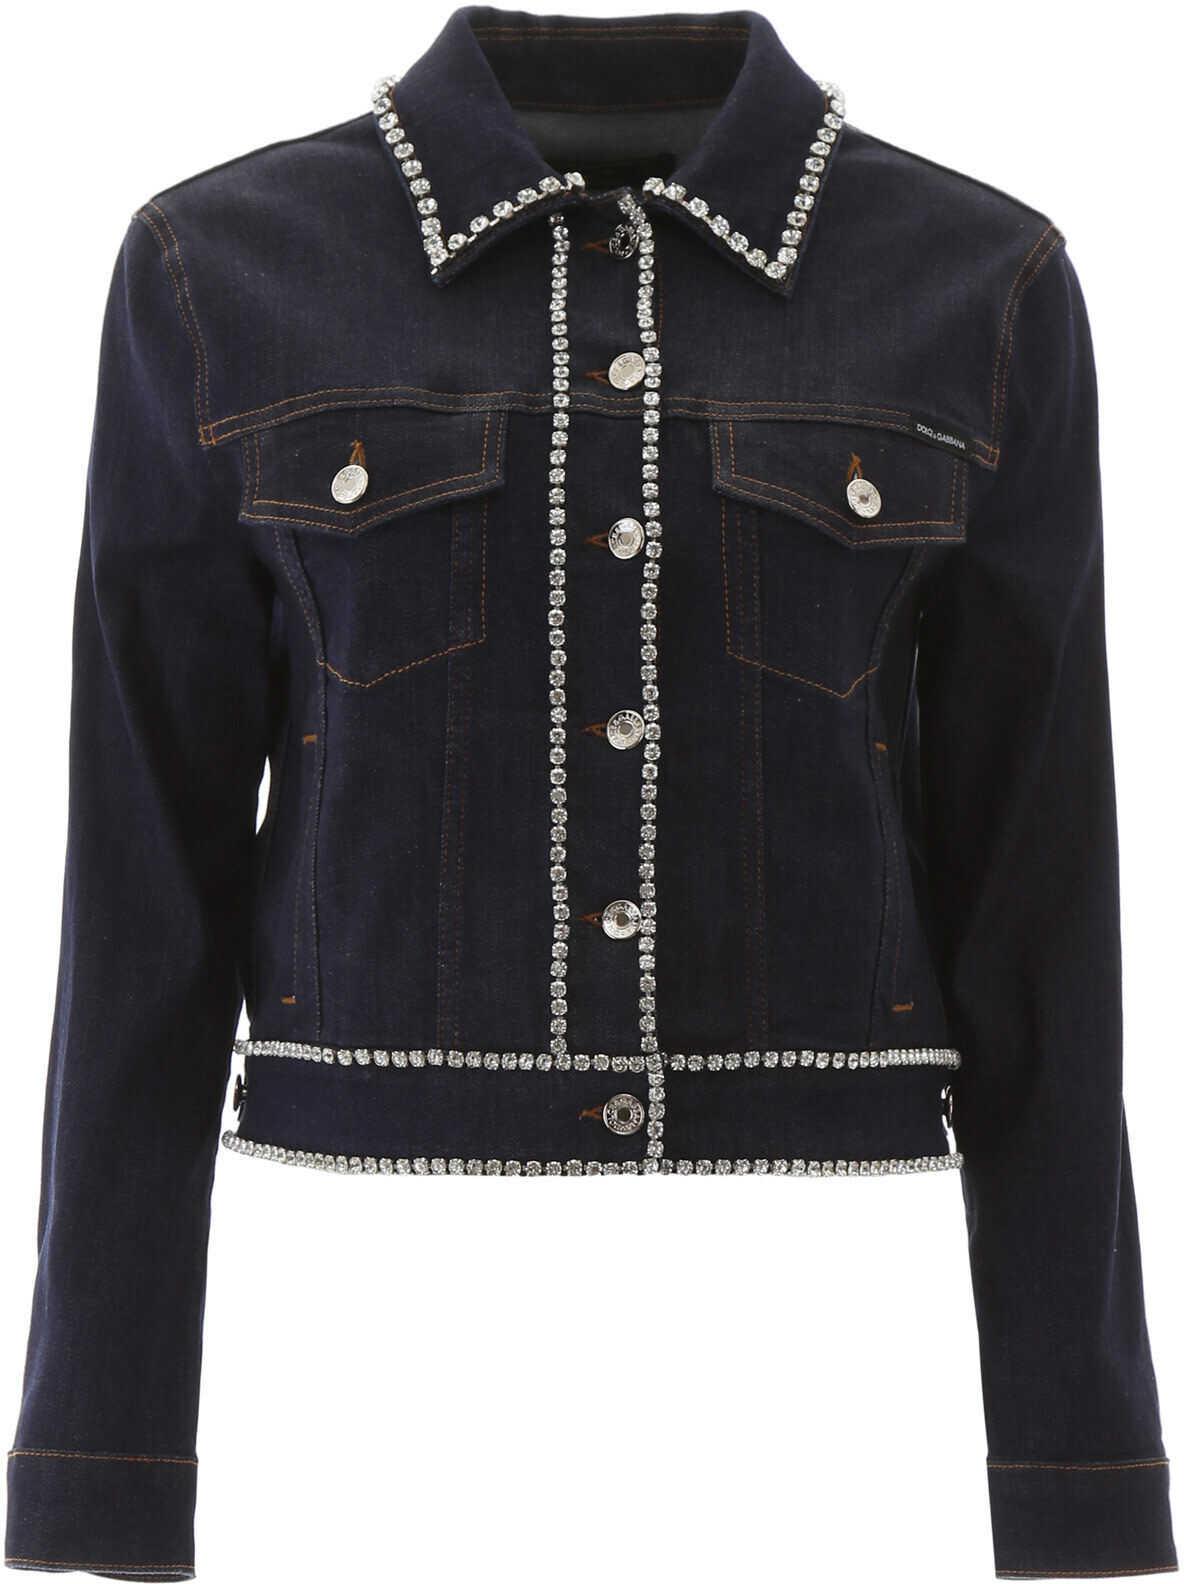 Dolce & Gabbana Denim Jacket With Crystals BLU SCURISSIMO 1